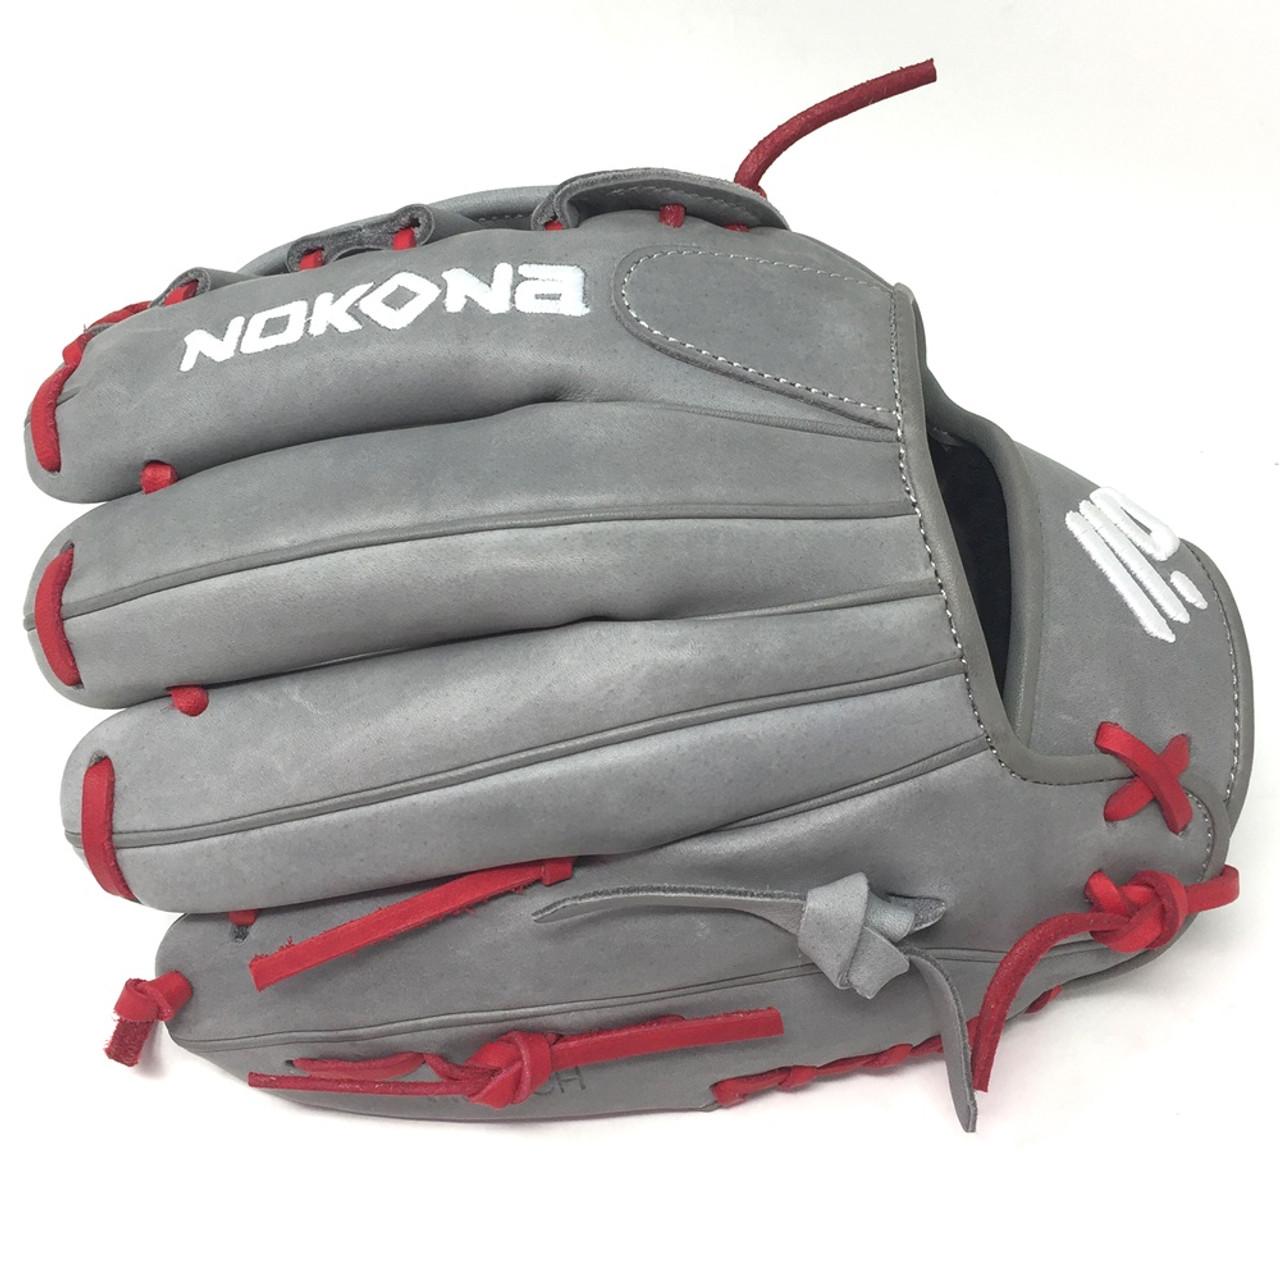 Nokona AmericanKIP Grey with Black Lace 11.5 Baseball Glove Modified Trap Web Right Handed Throw